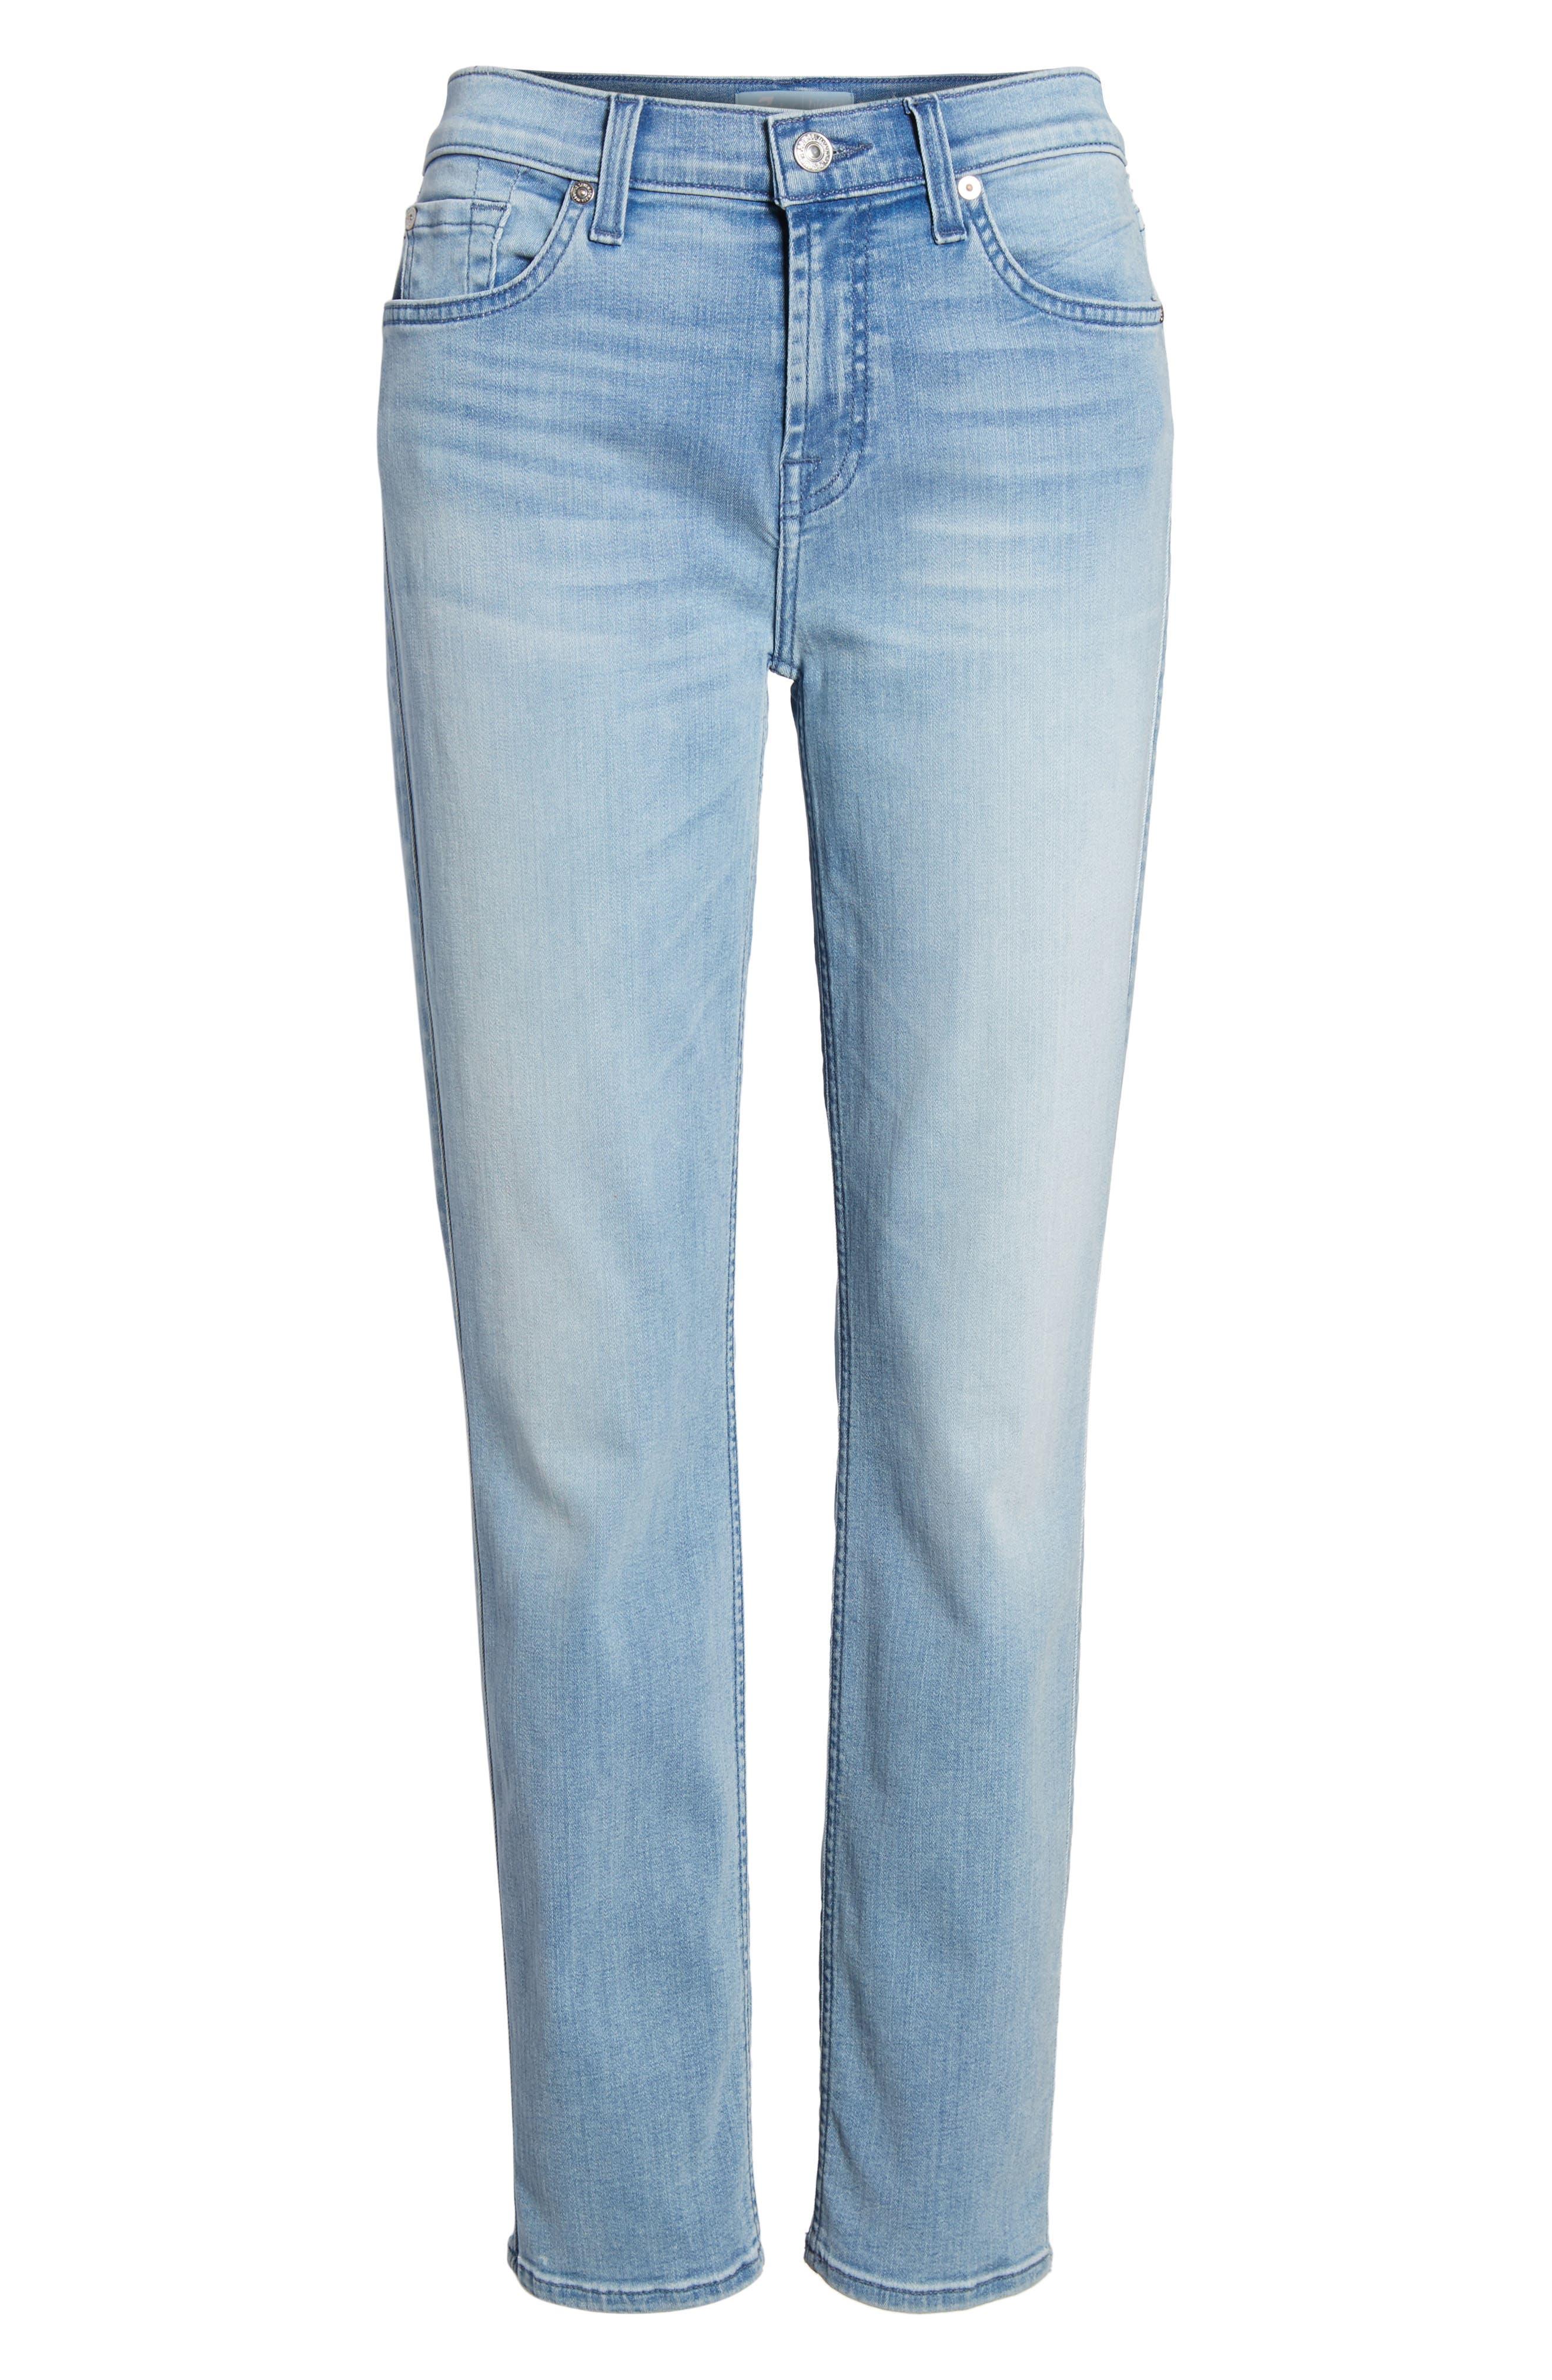 b(air) Roxanne Ankle Skinny Jeans,                             Alternate thumbnail 7, color,                             401